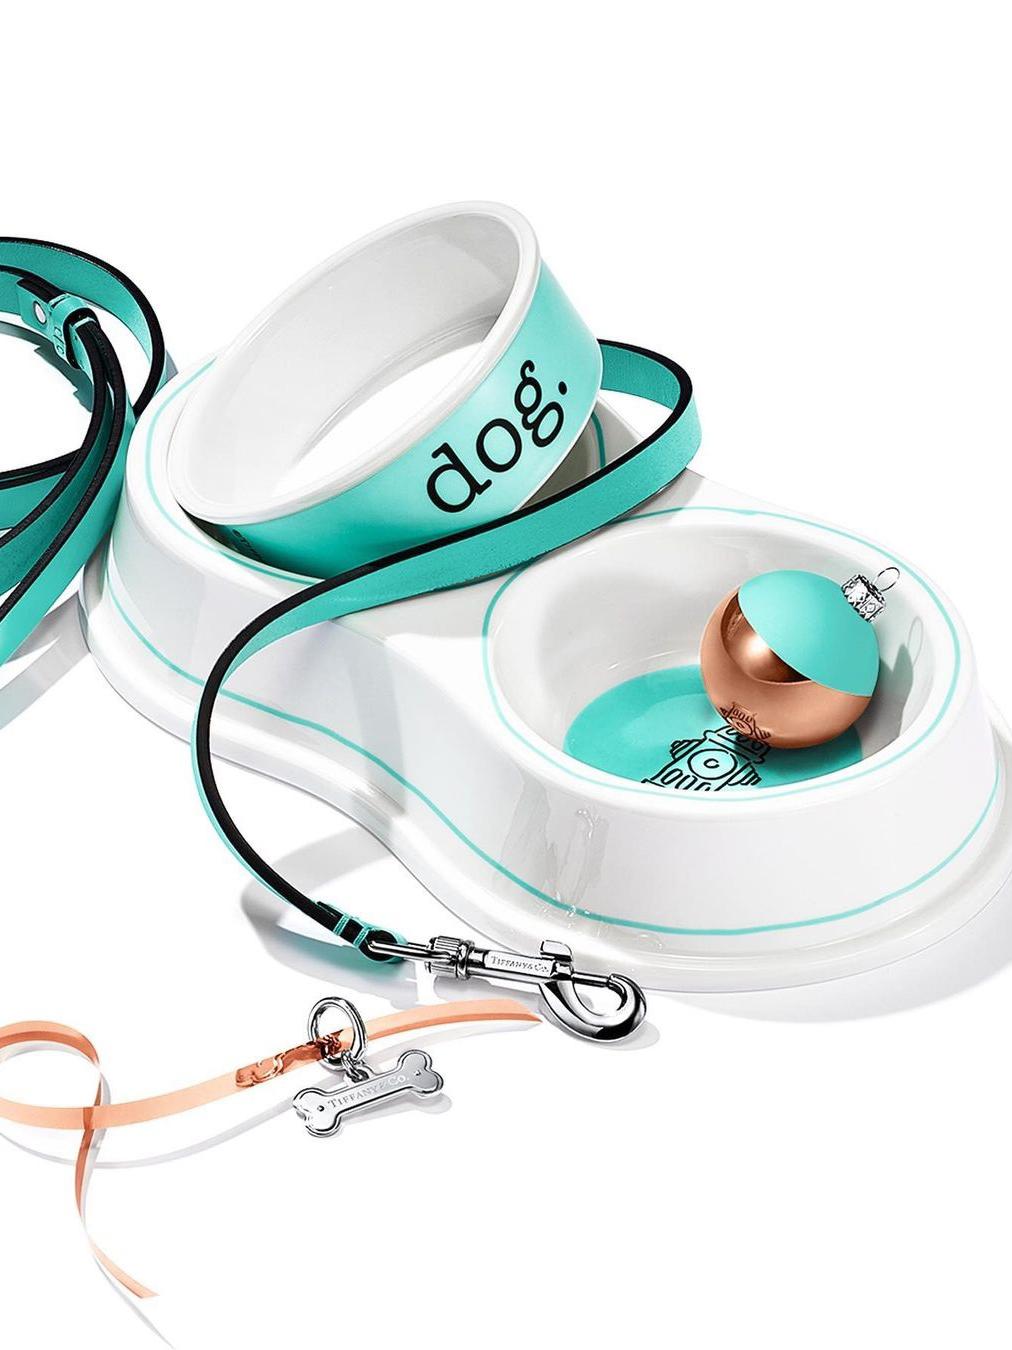 《Tiffany&Co. 》2021春夏宠物用品系列Lookbook